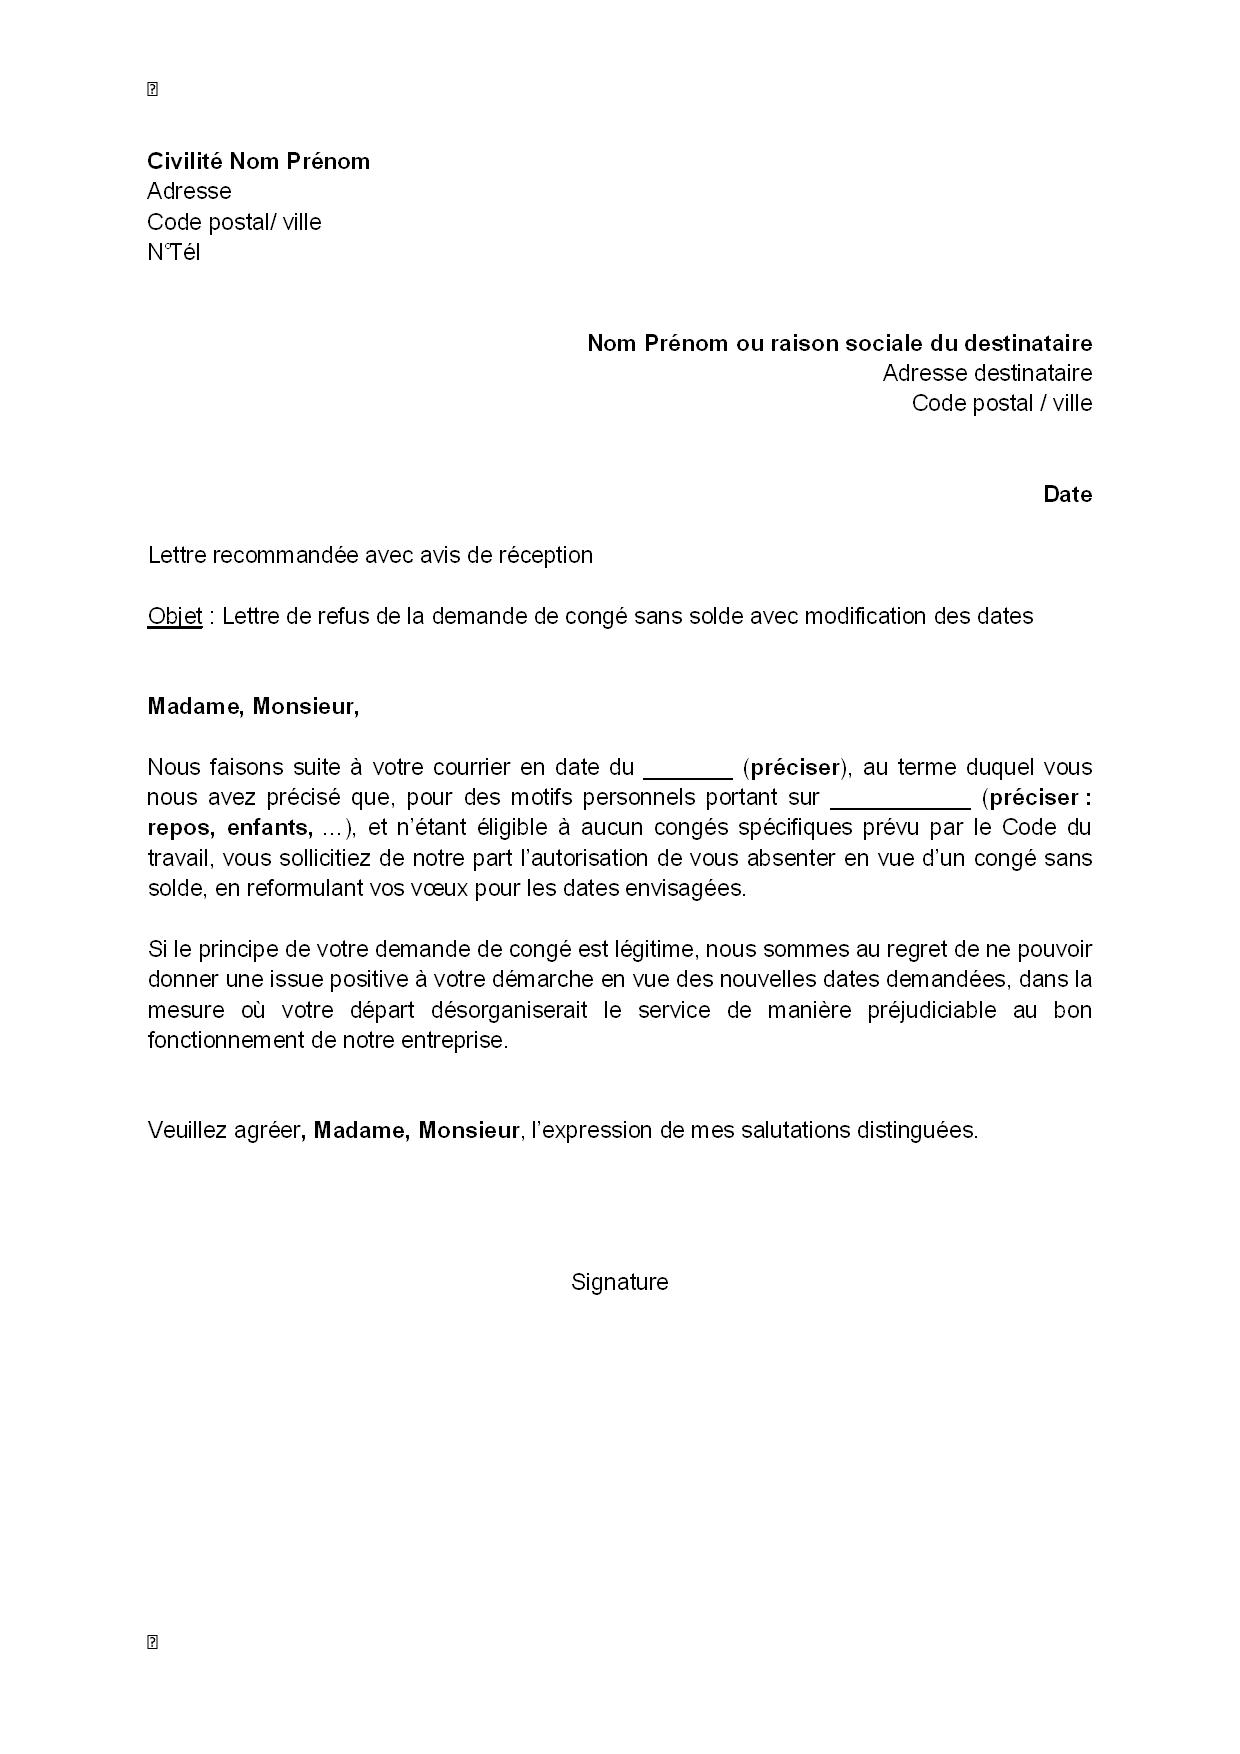 lettre de refus  par l u0026 39 employeur  de la demande de cong u00e9